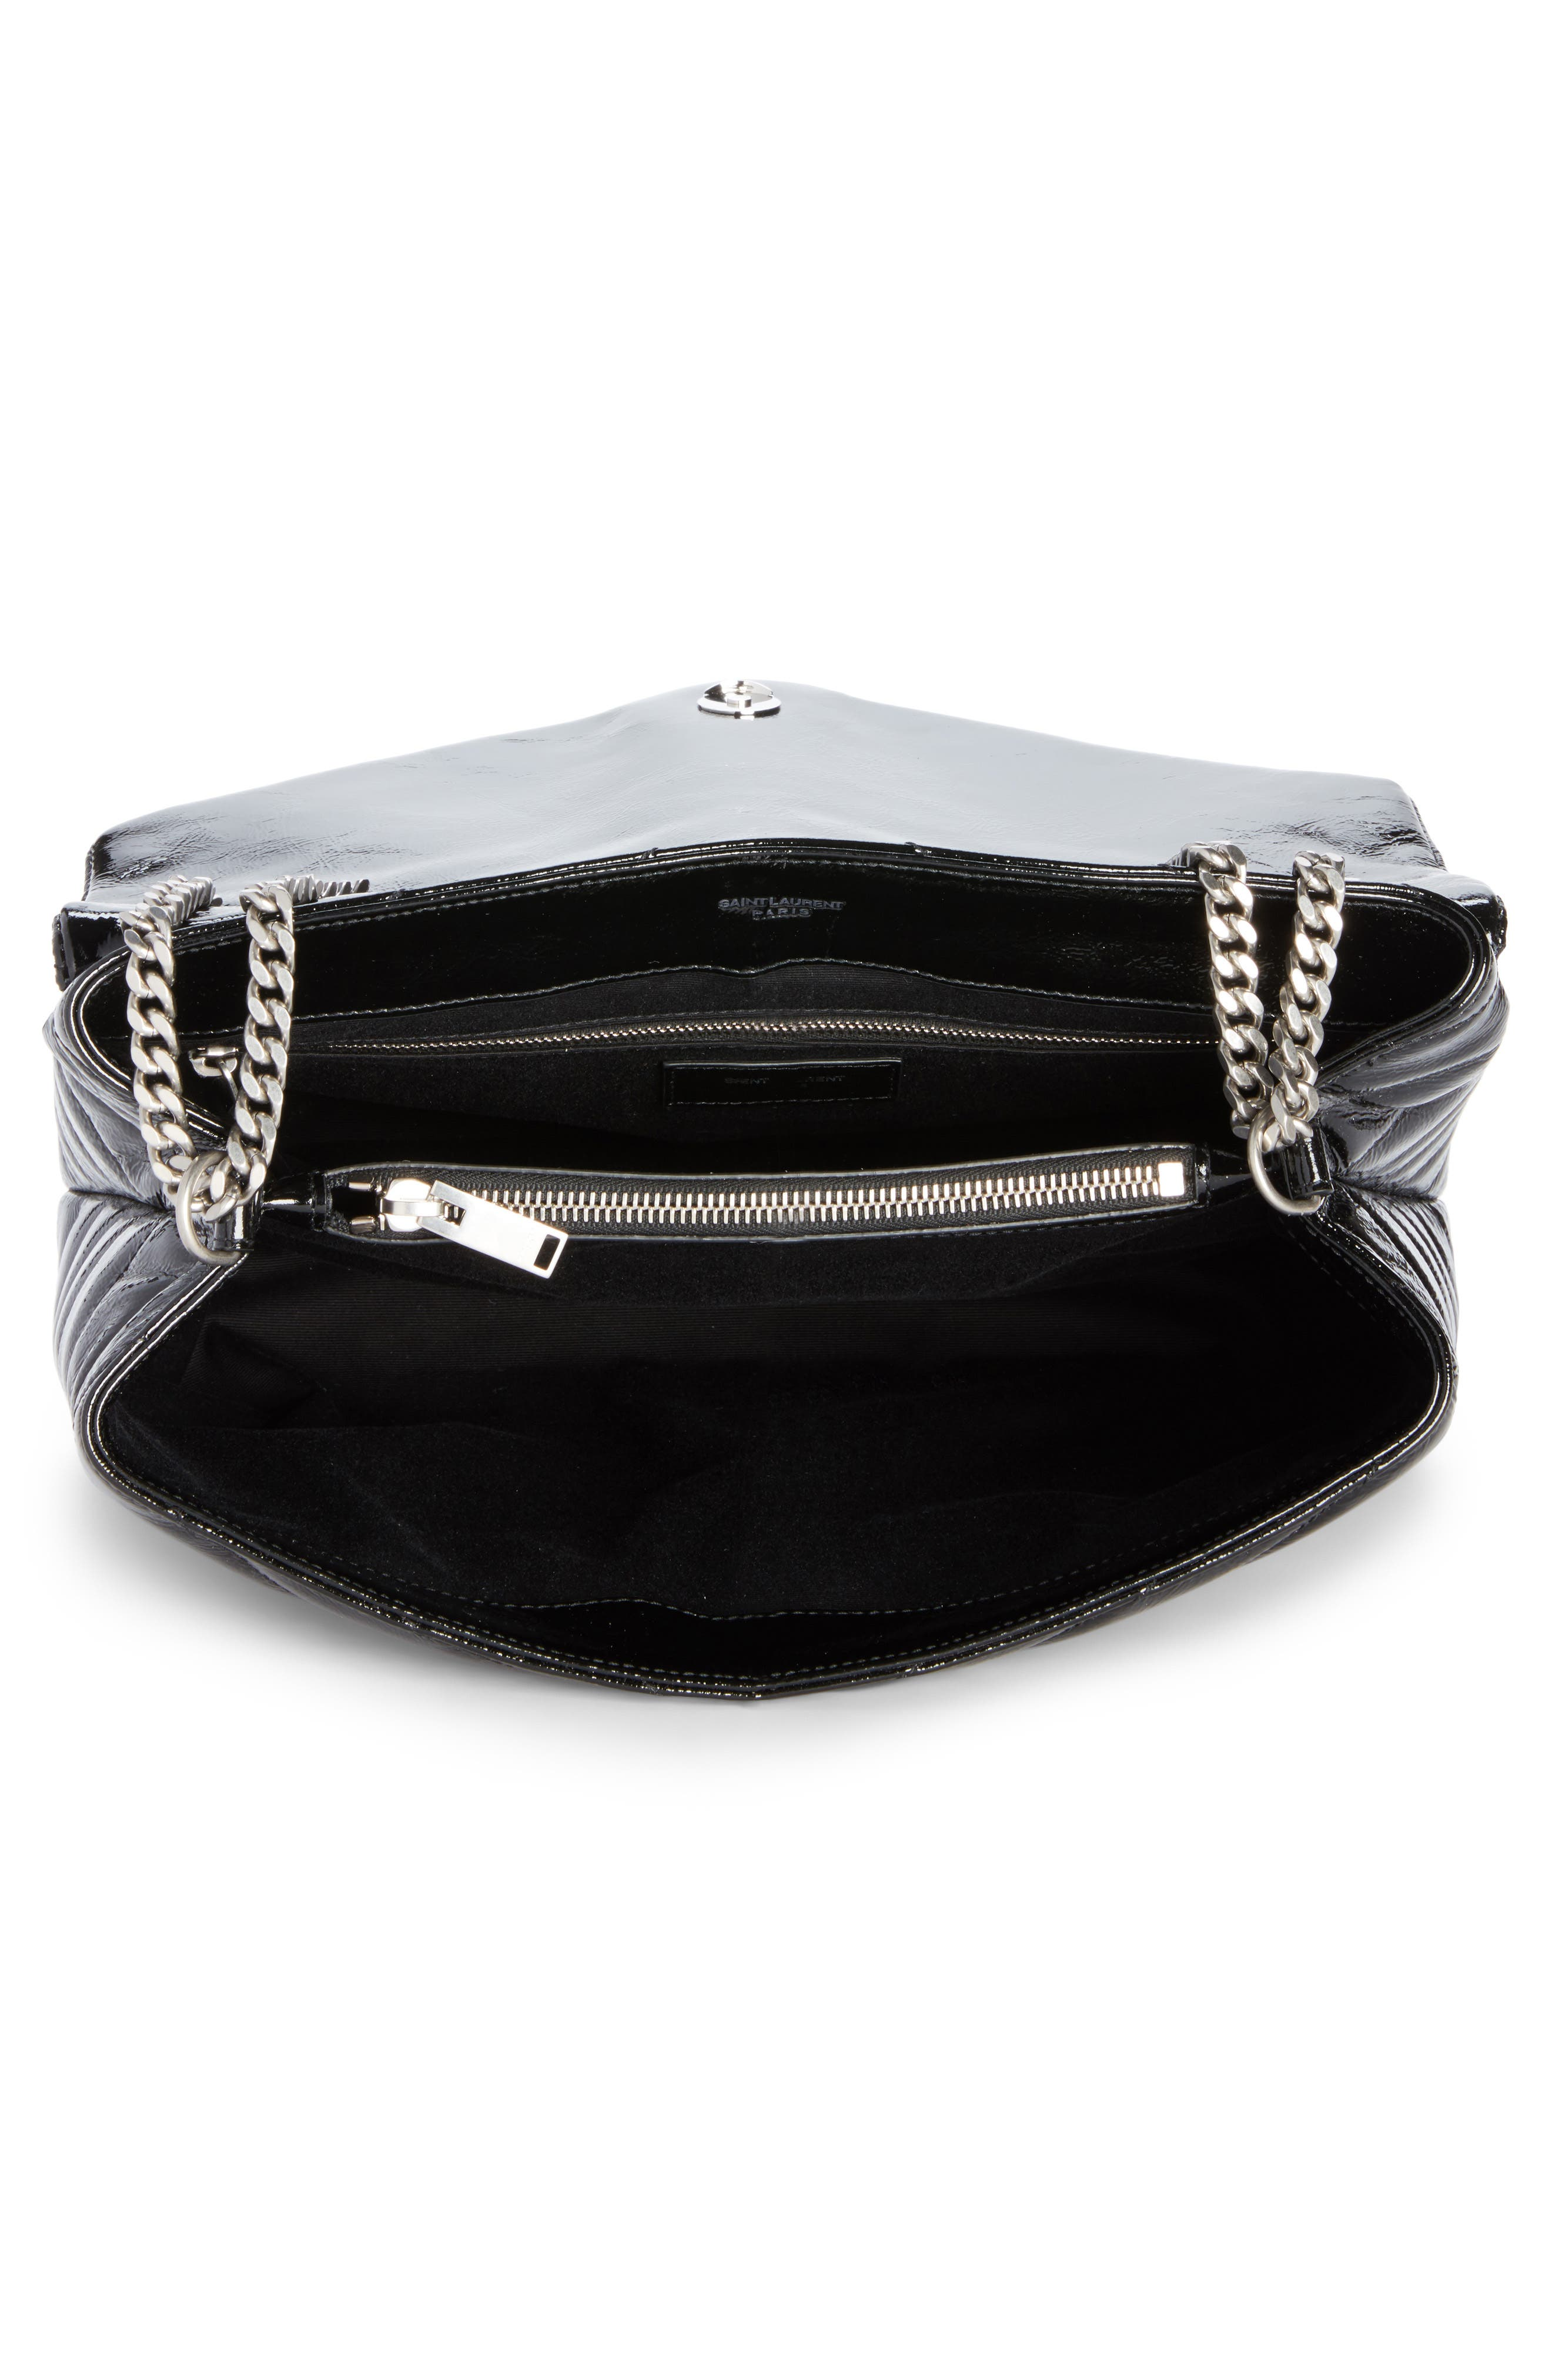 Alternate Image 3  - Saint Laurent Medium LouLou Patent Leather Shoulder Bag